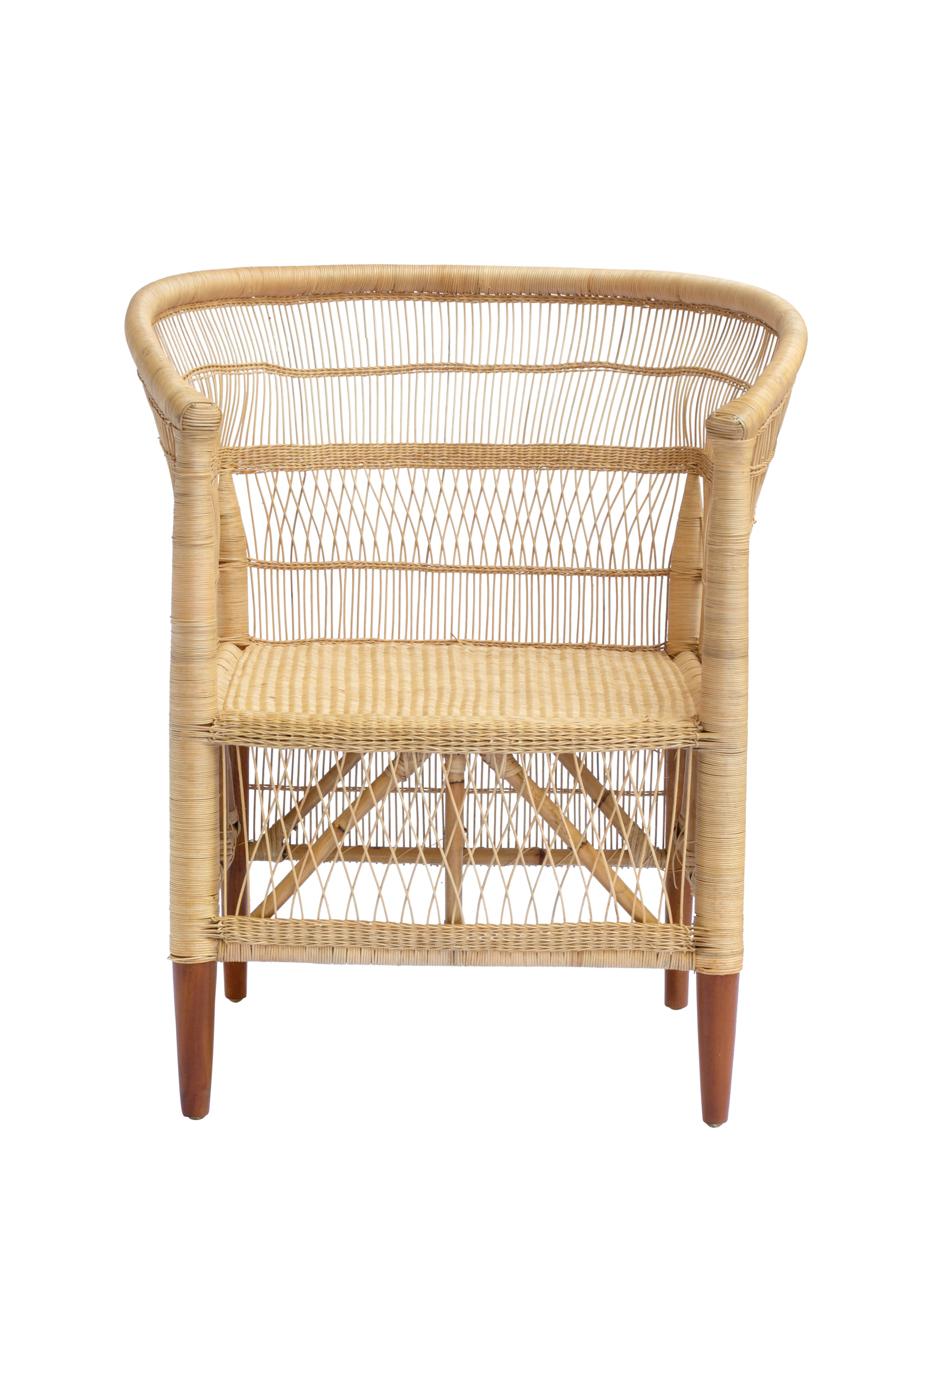 Malawi chair in rattan and bamboo